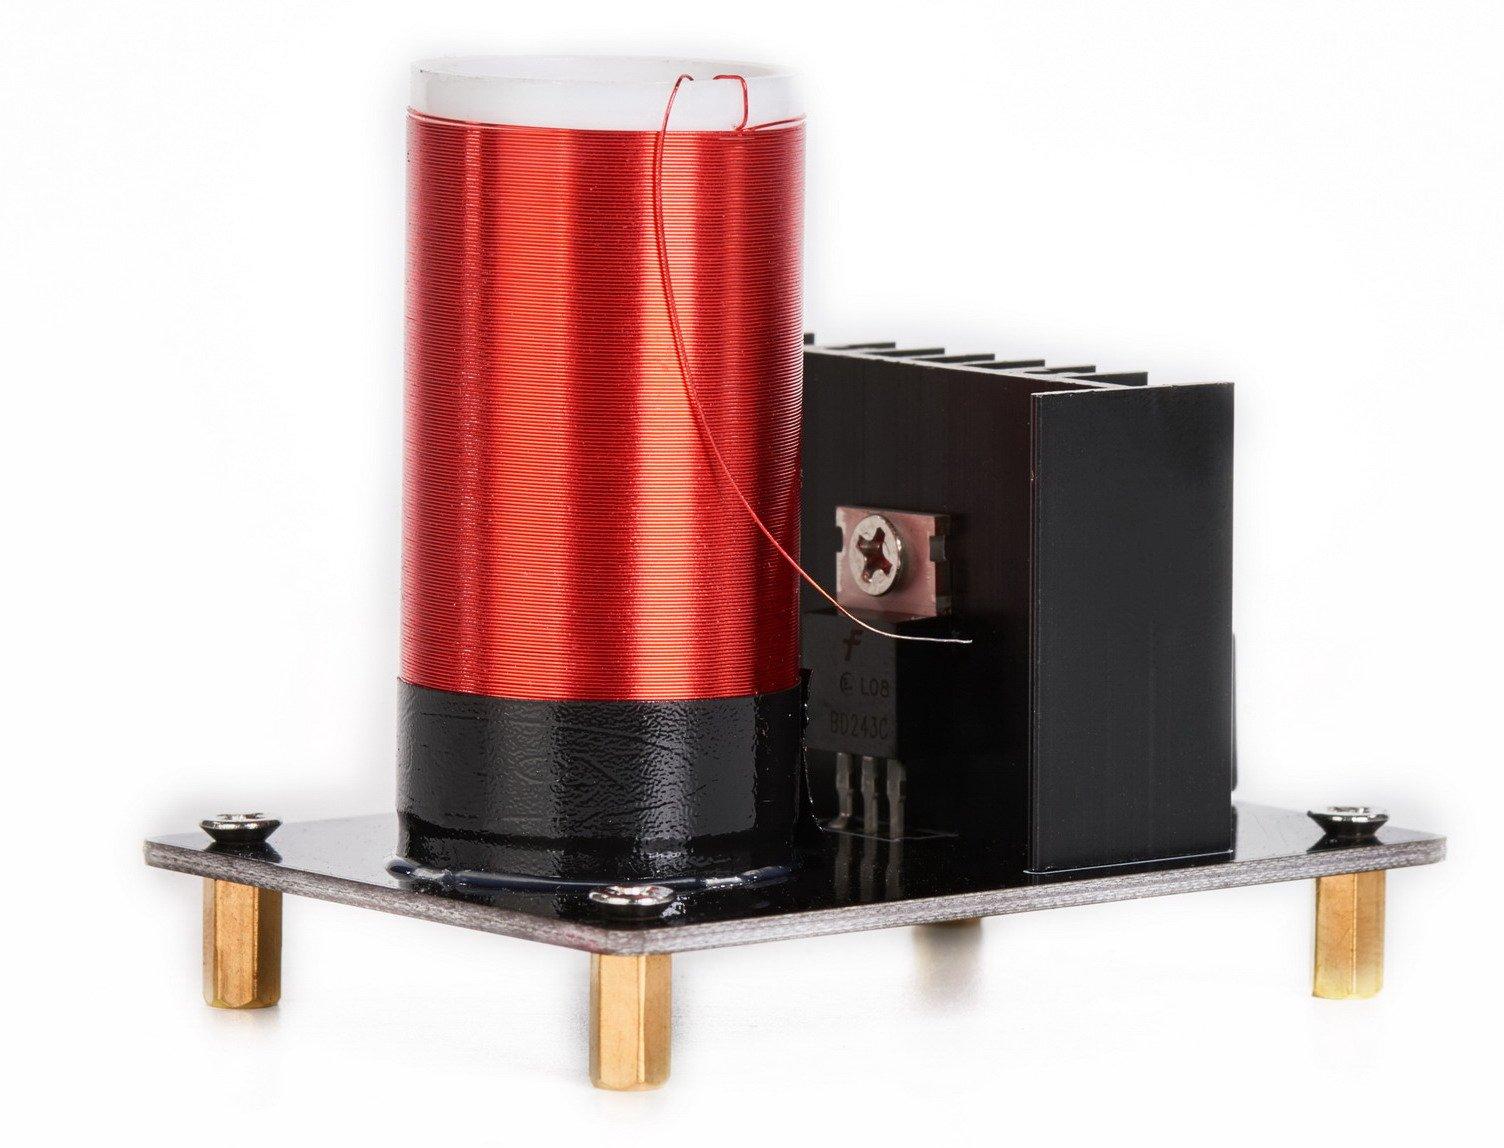 Sunnytech Tesla Coil Super Mini Tesla's Coil Model (20W Tesla Coil) M065